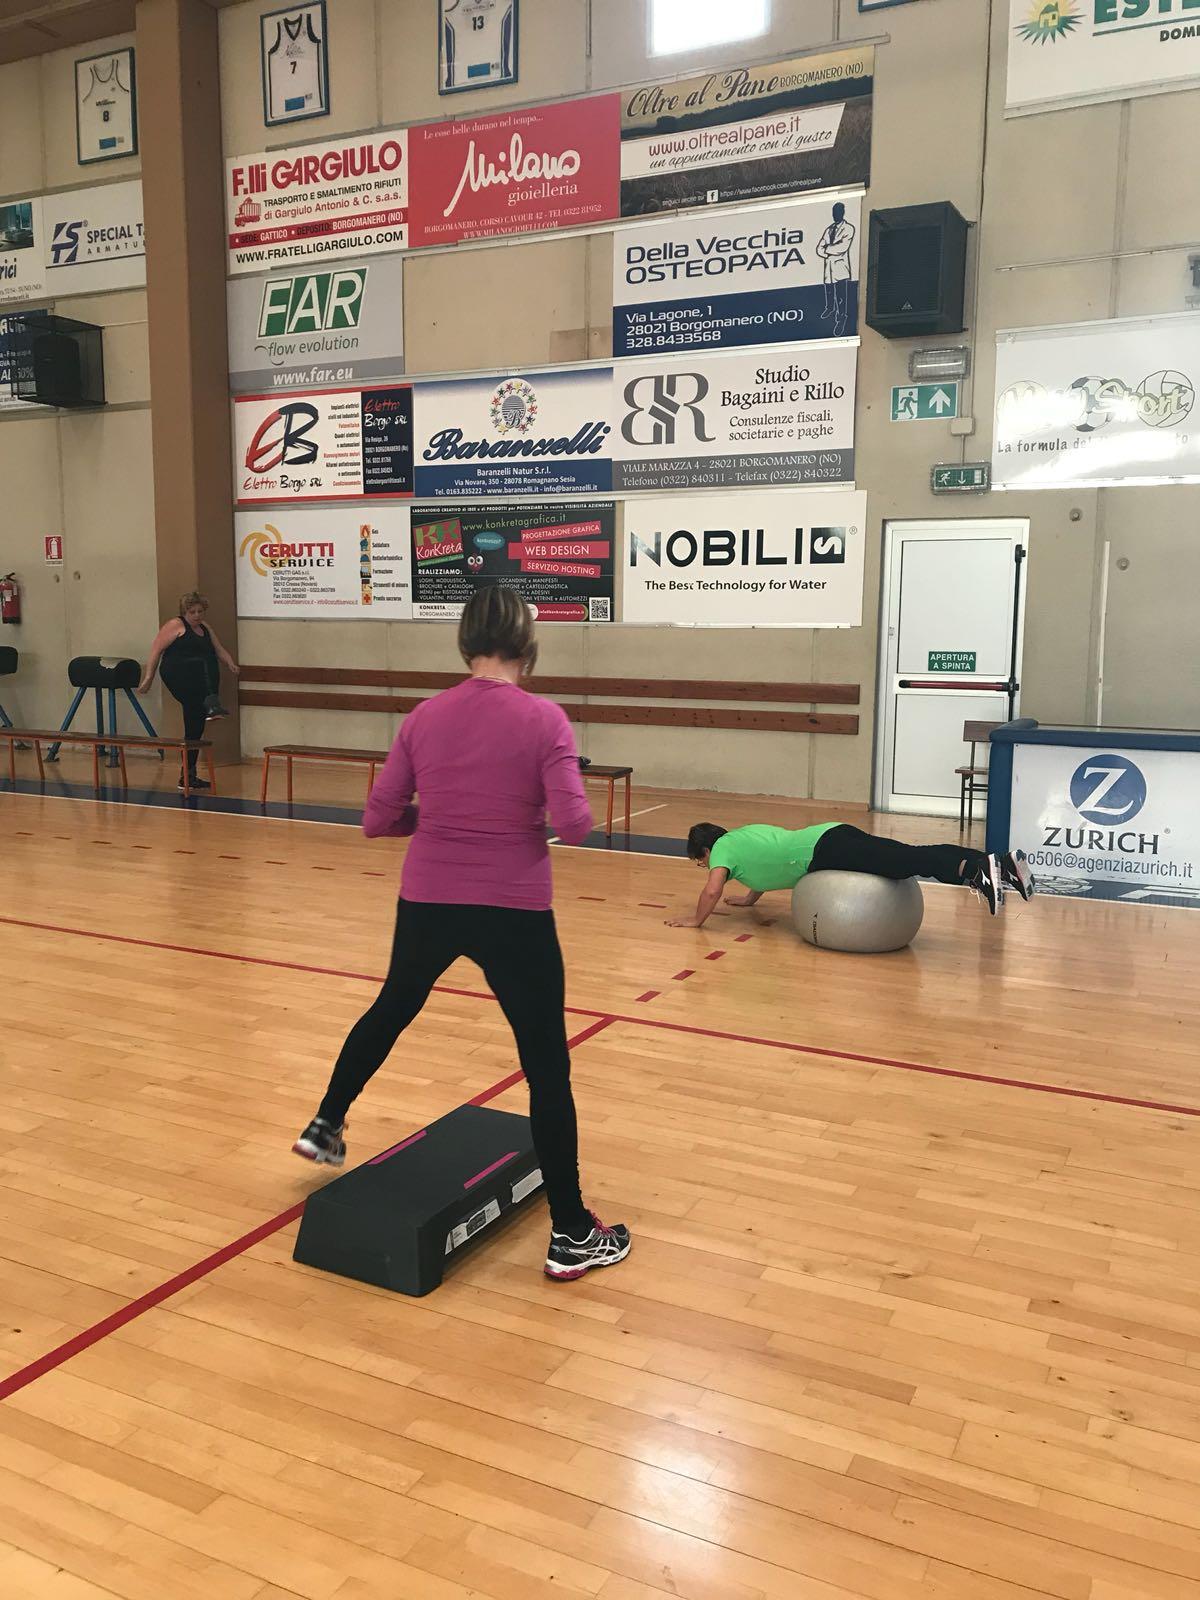 Personal training m2w 6